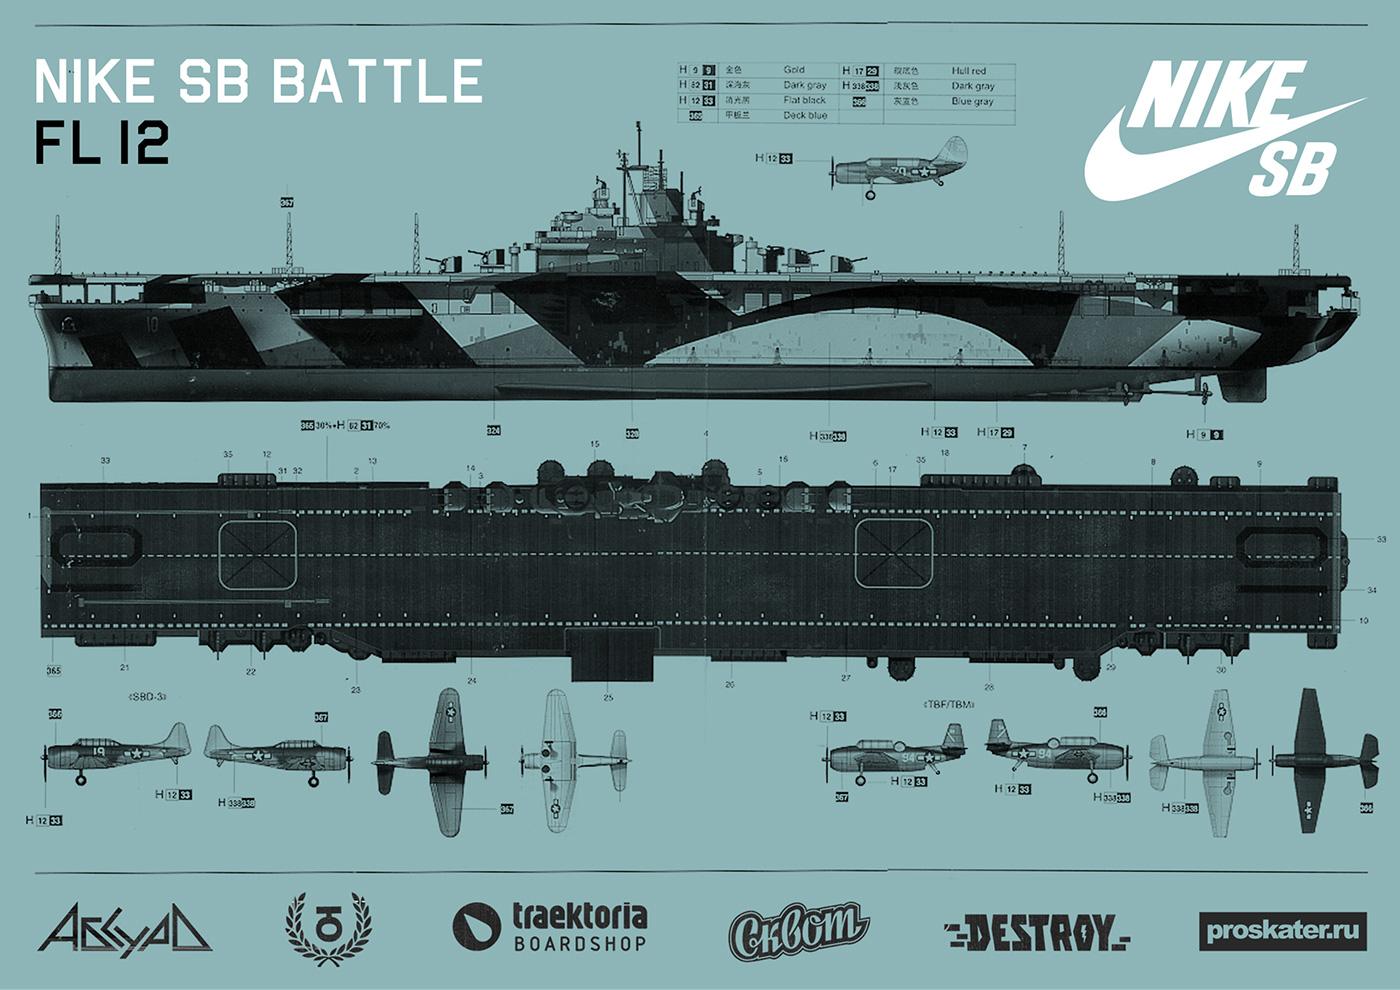 NikeSBbattle_portfolio_1400x790_09.jpg